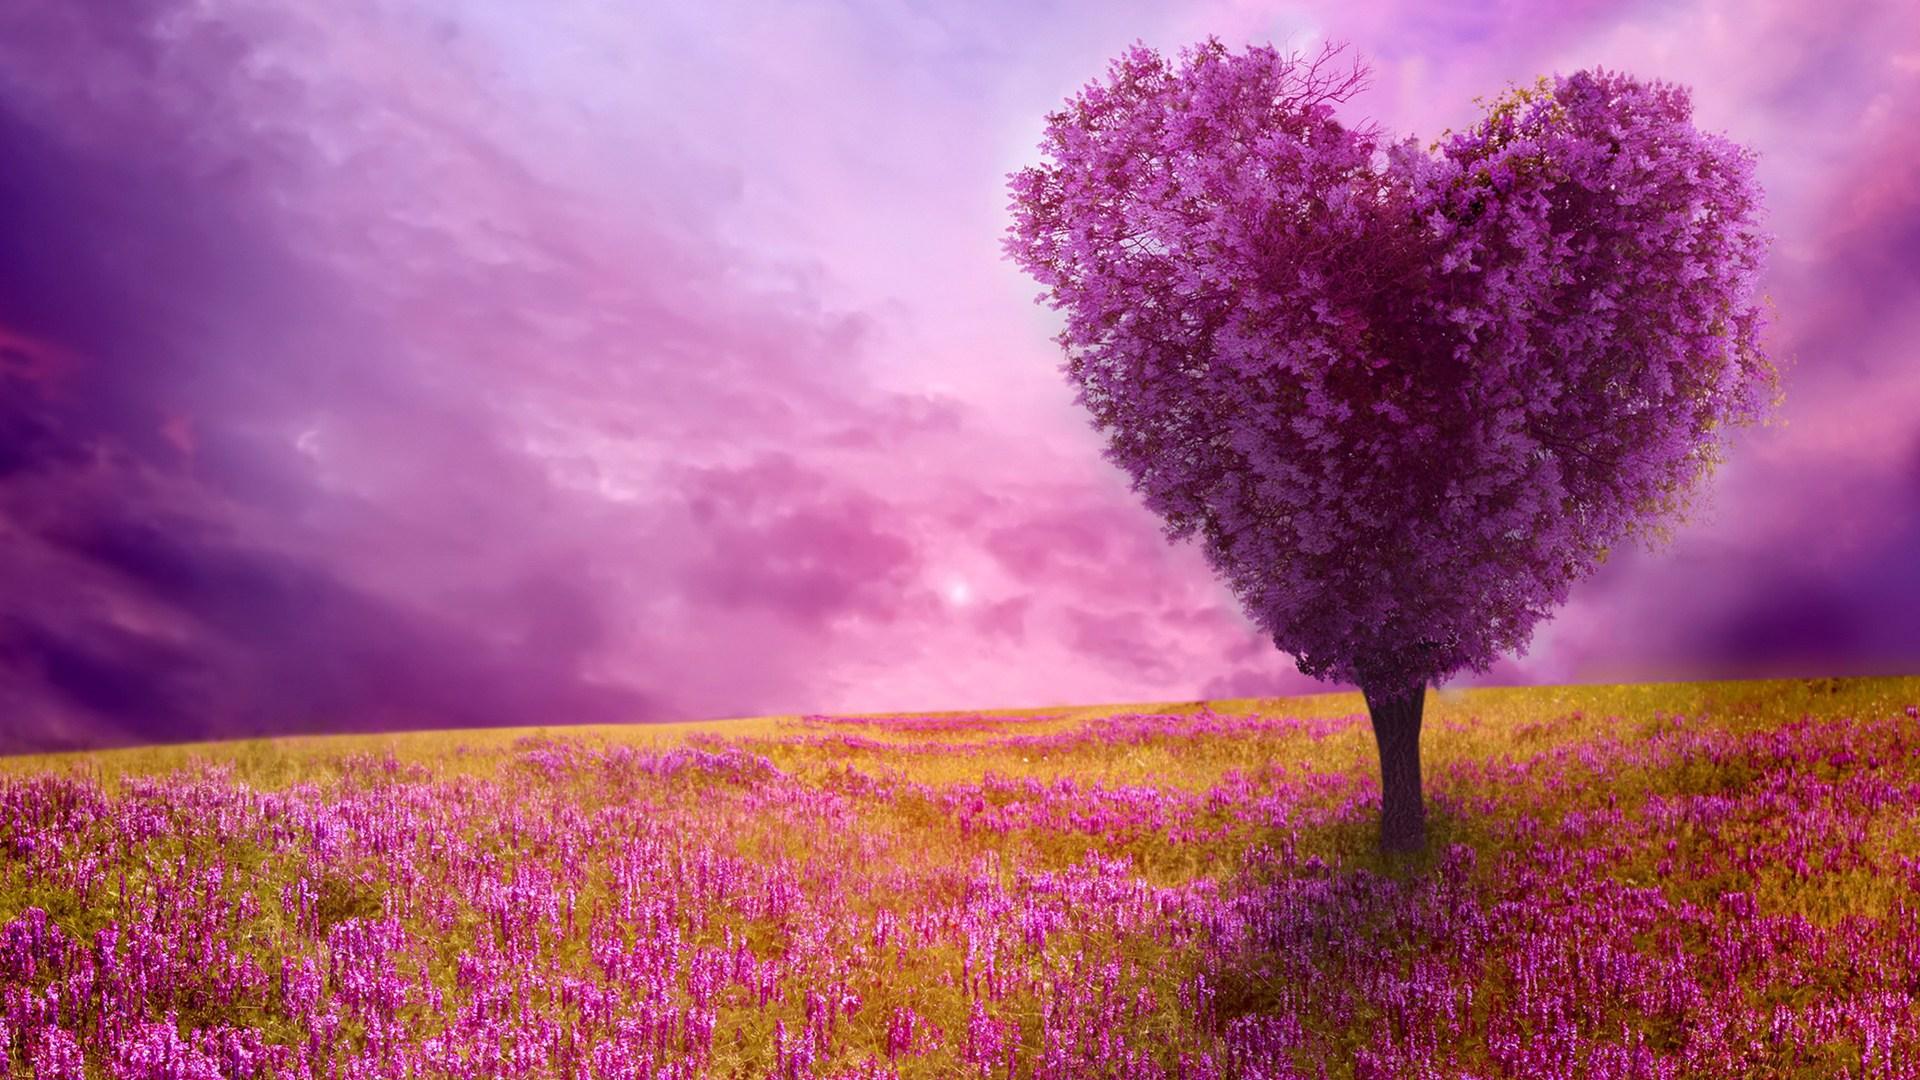 Hd wallpaper spring - Top 10 Hd Spring Season Desktop Backgrounds Wallpapers